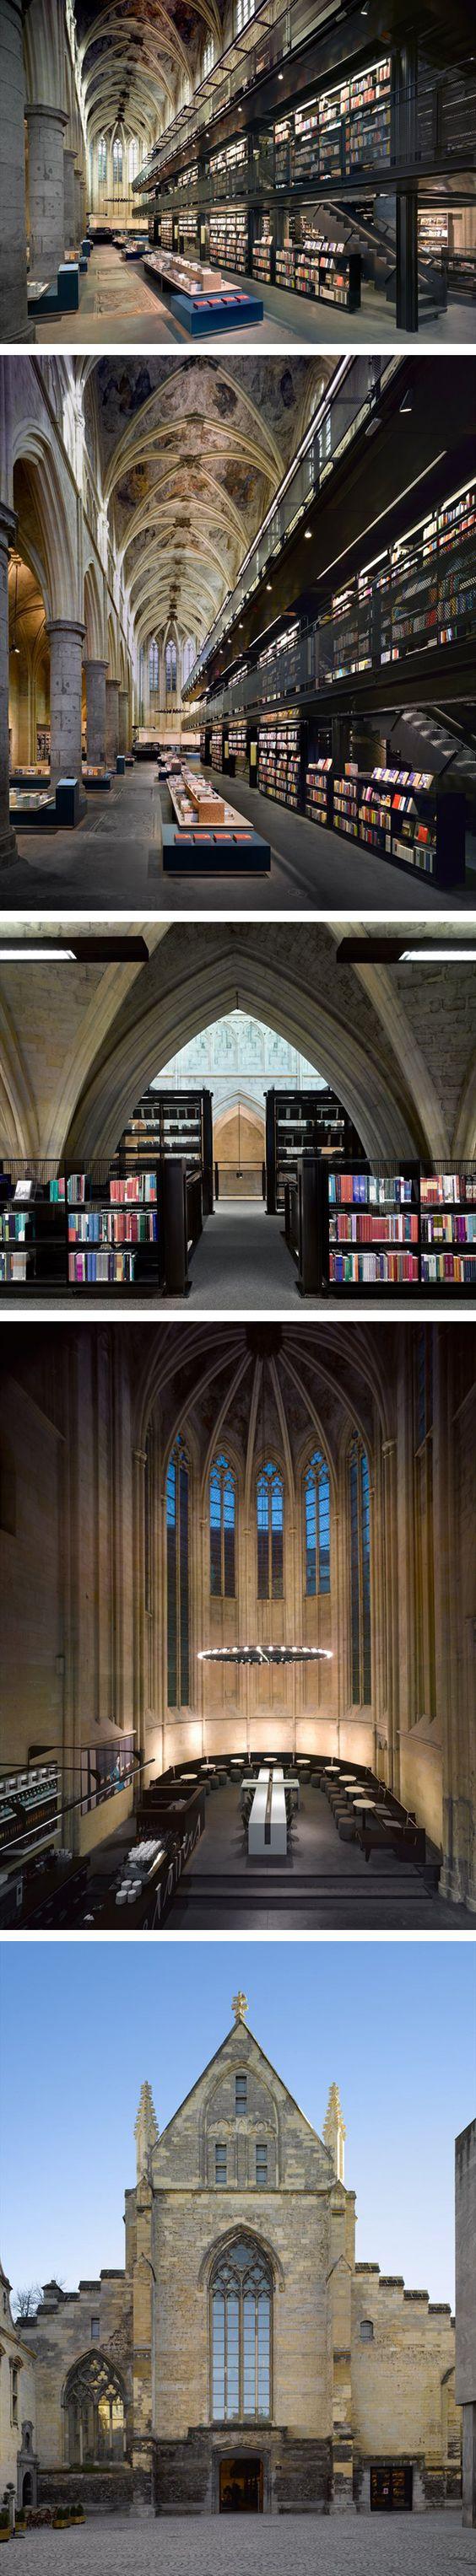 Selexyz-Dominicanen Library.   Project by Merkx+Girod architects.